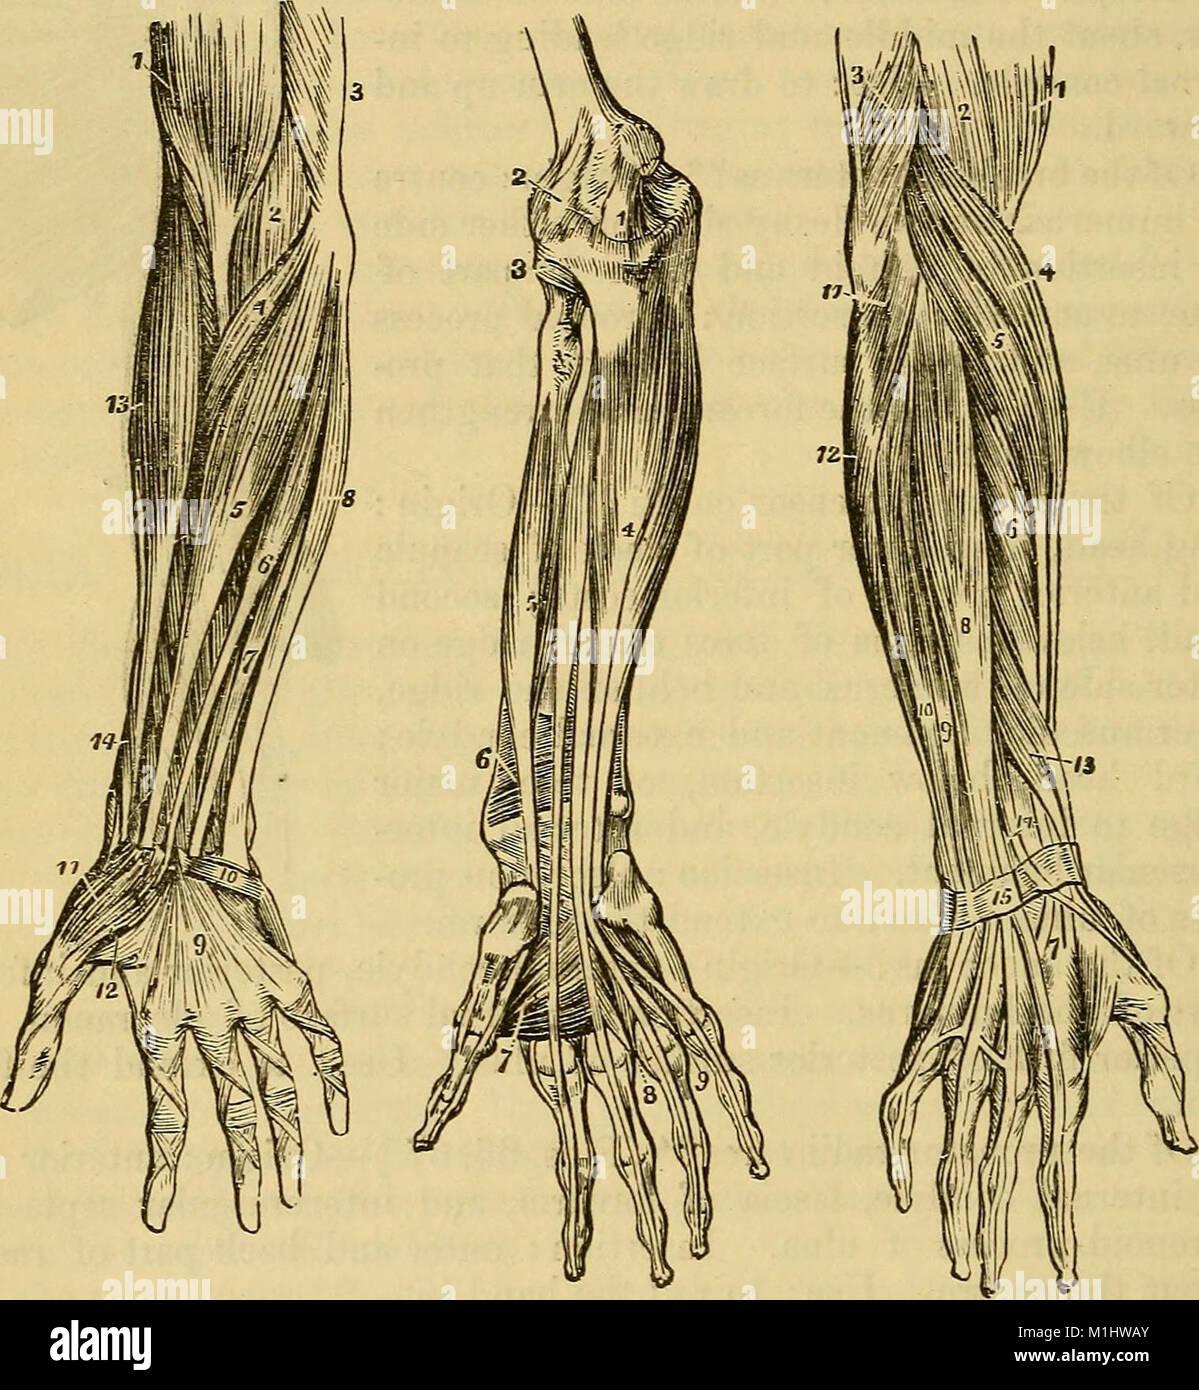 History Of Anatomy Stock Photos & History Of Anatomy Stock Images ...